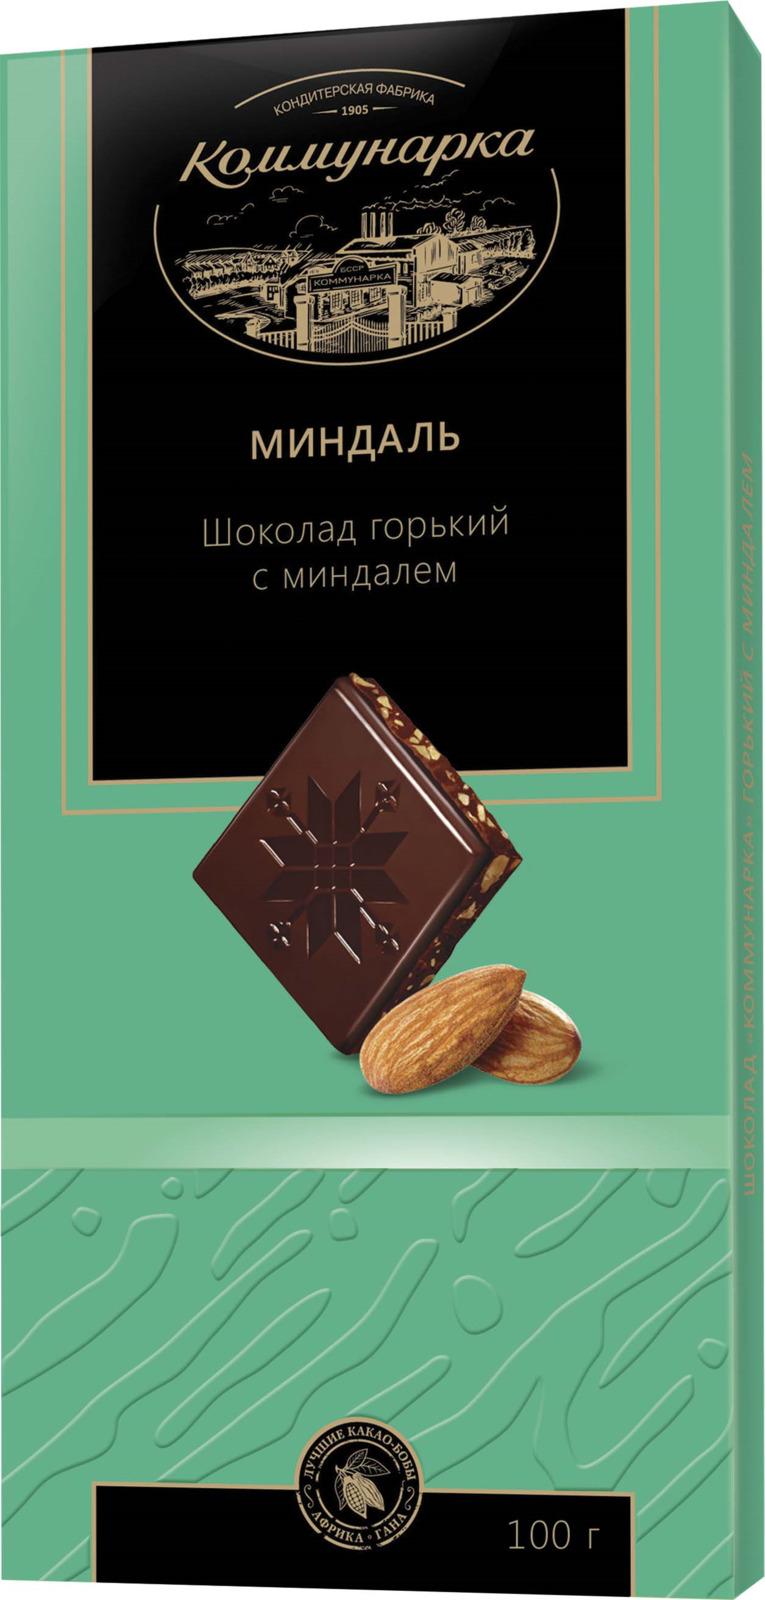 Шоколад Коммунарка, горький, с миндалем, 100 г цена 2017